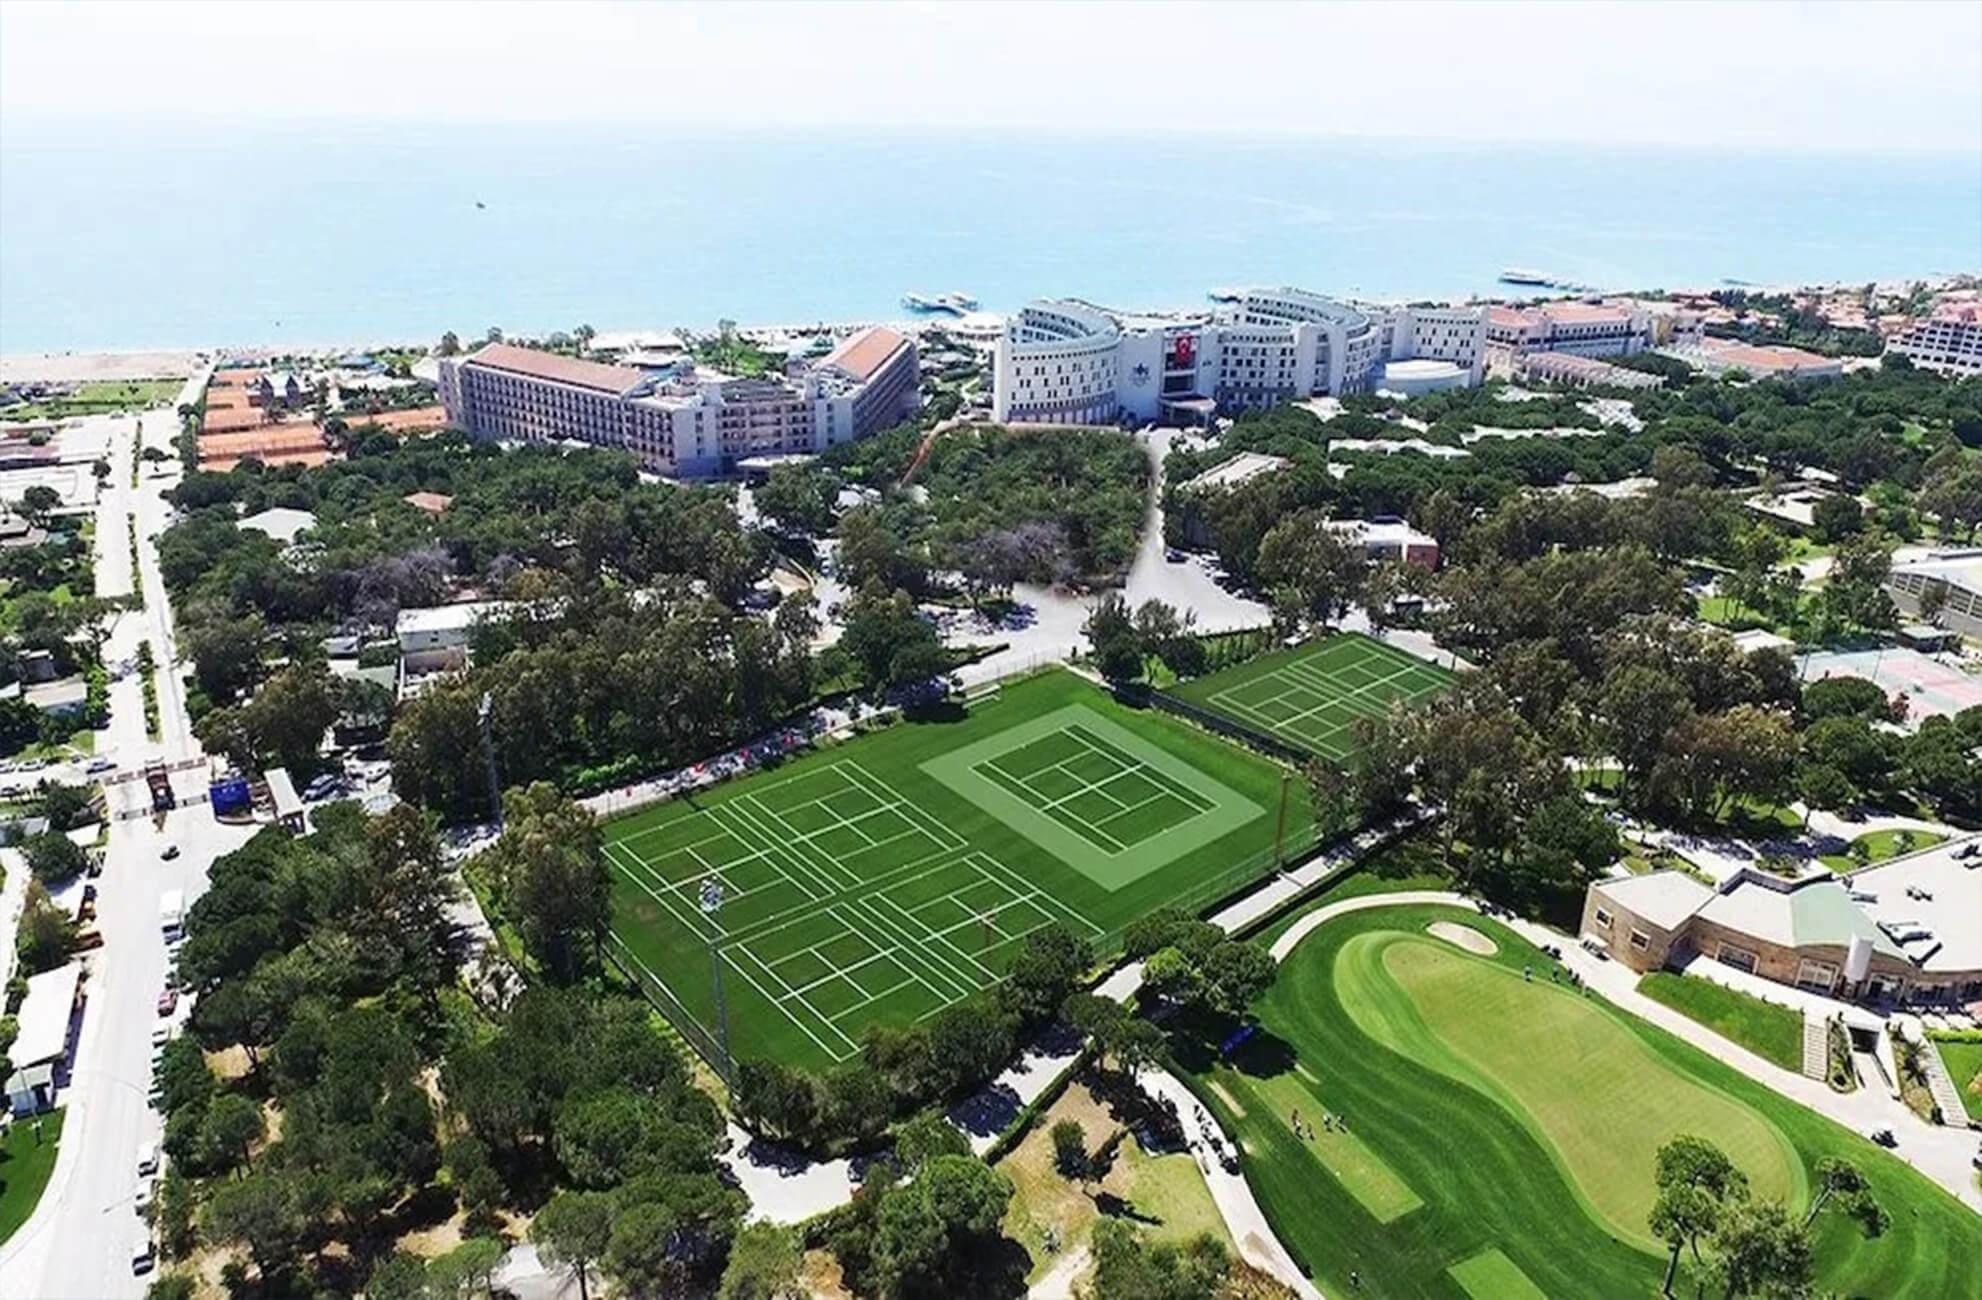 Belek Golf Green Turf Sports